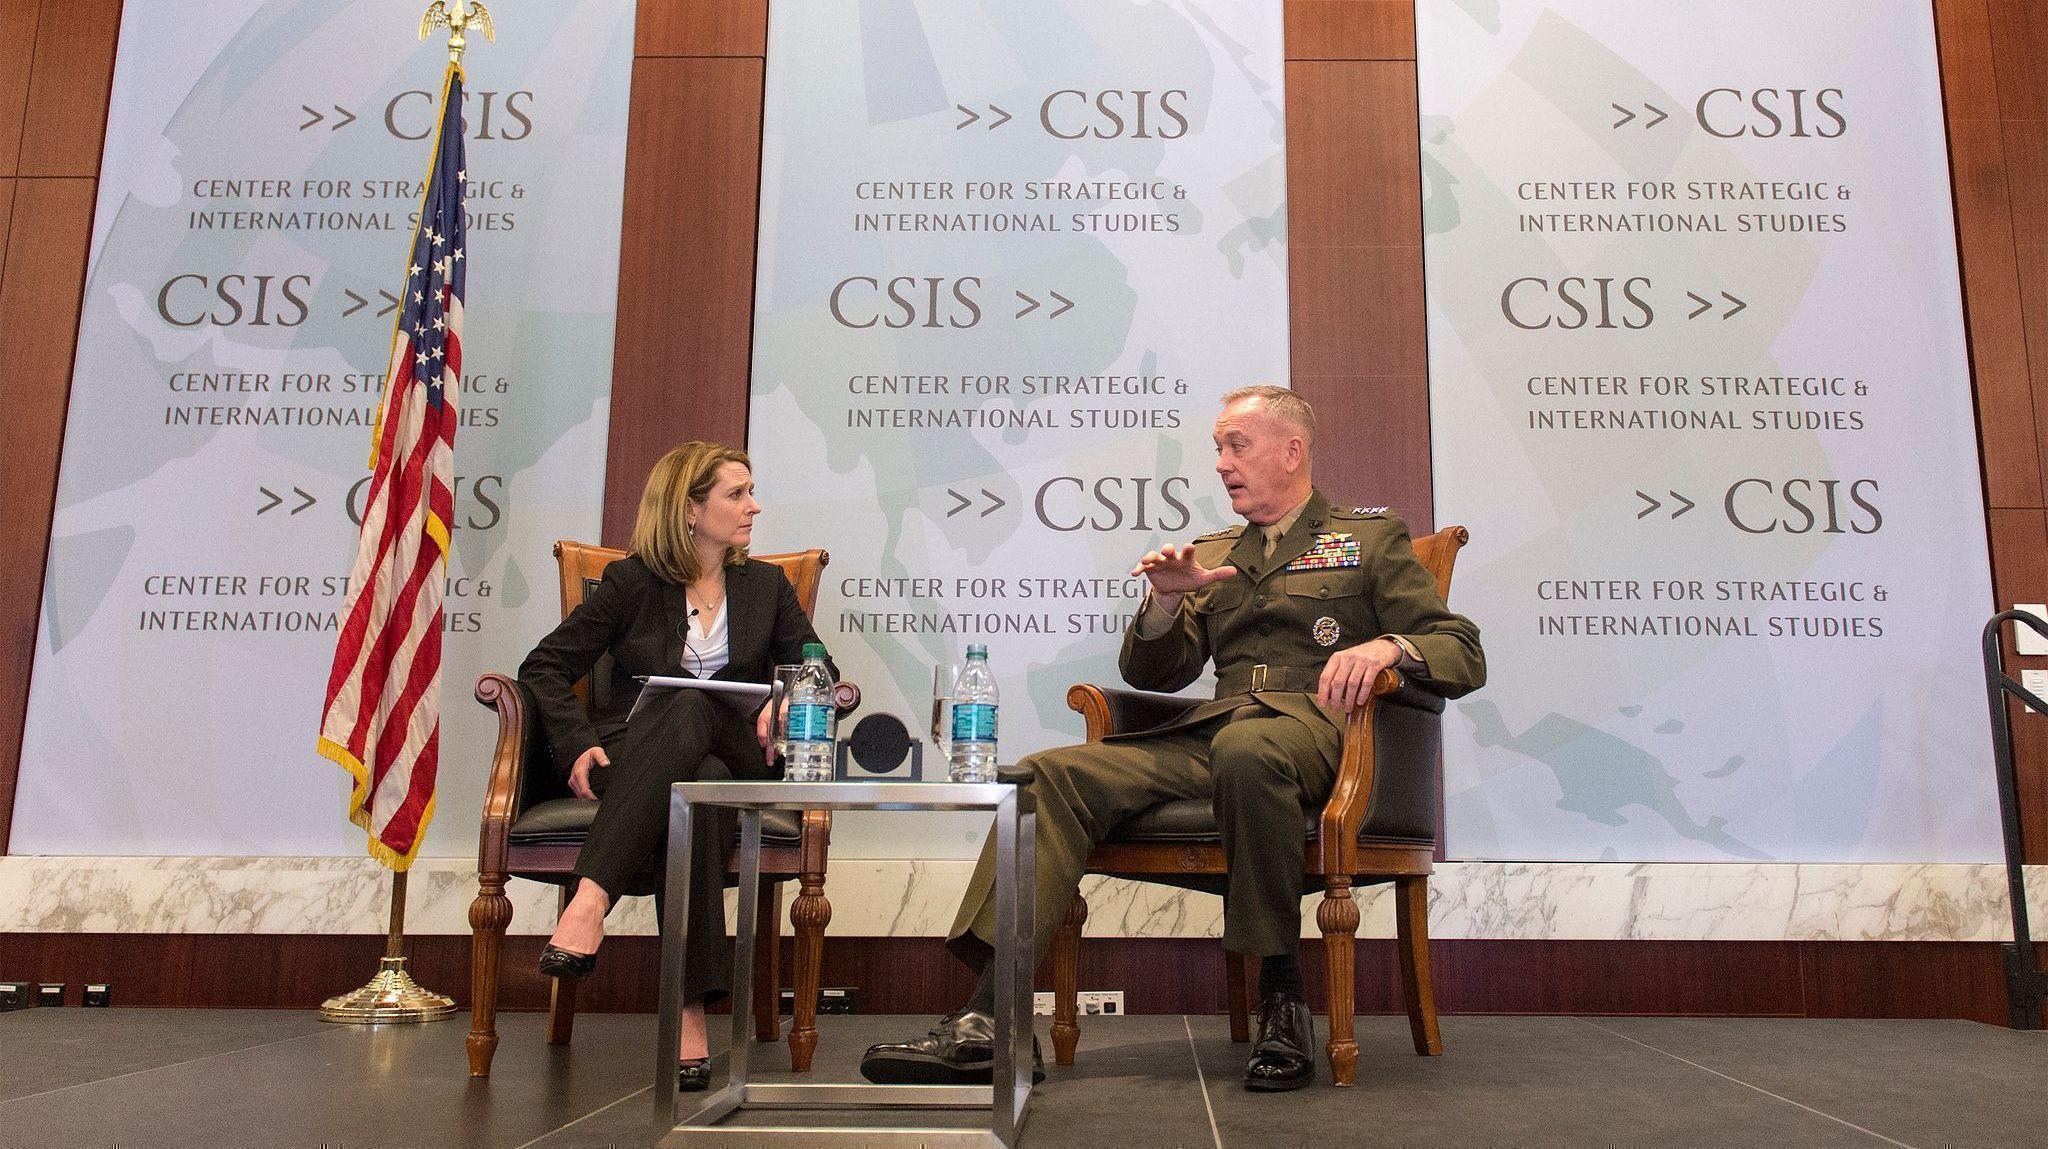 На космодроме КНДР зафиксирована активность американским центром CSIS